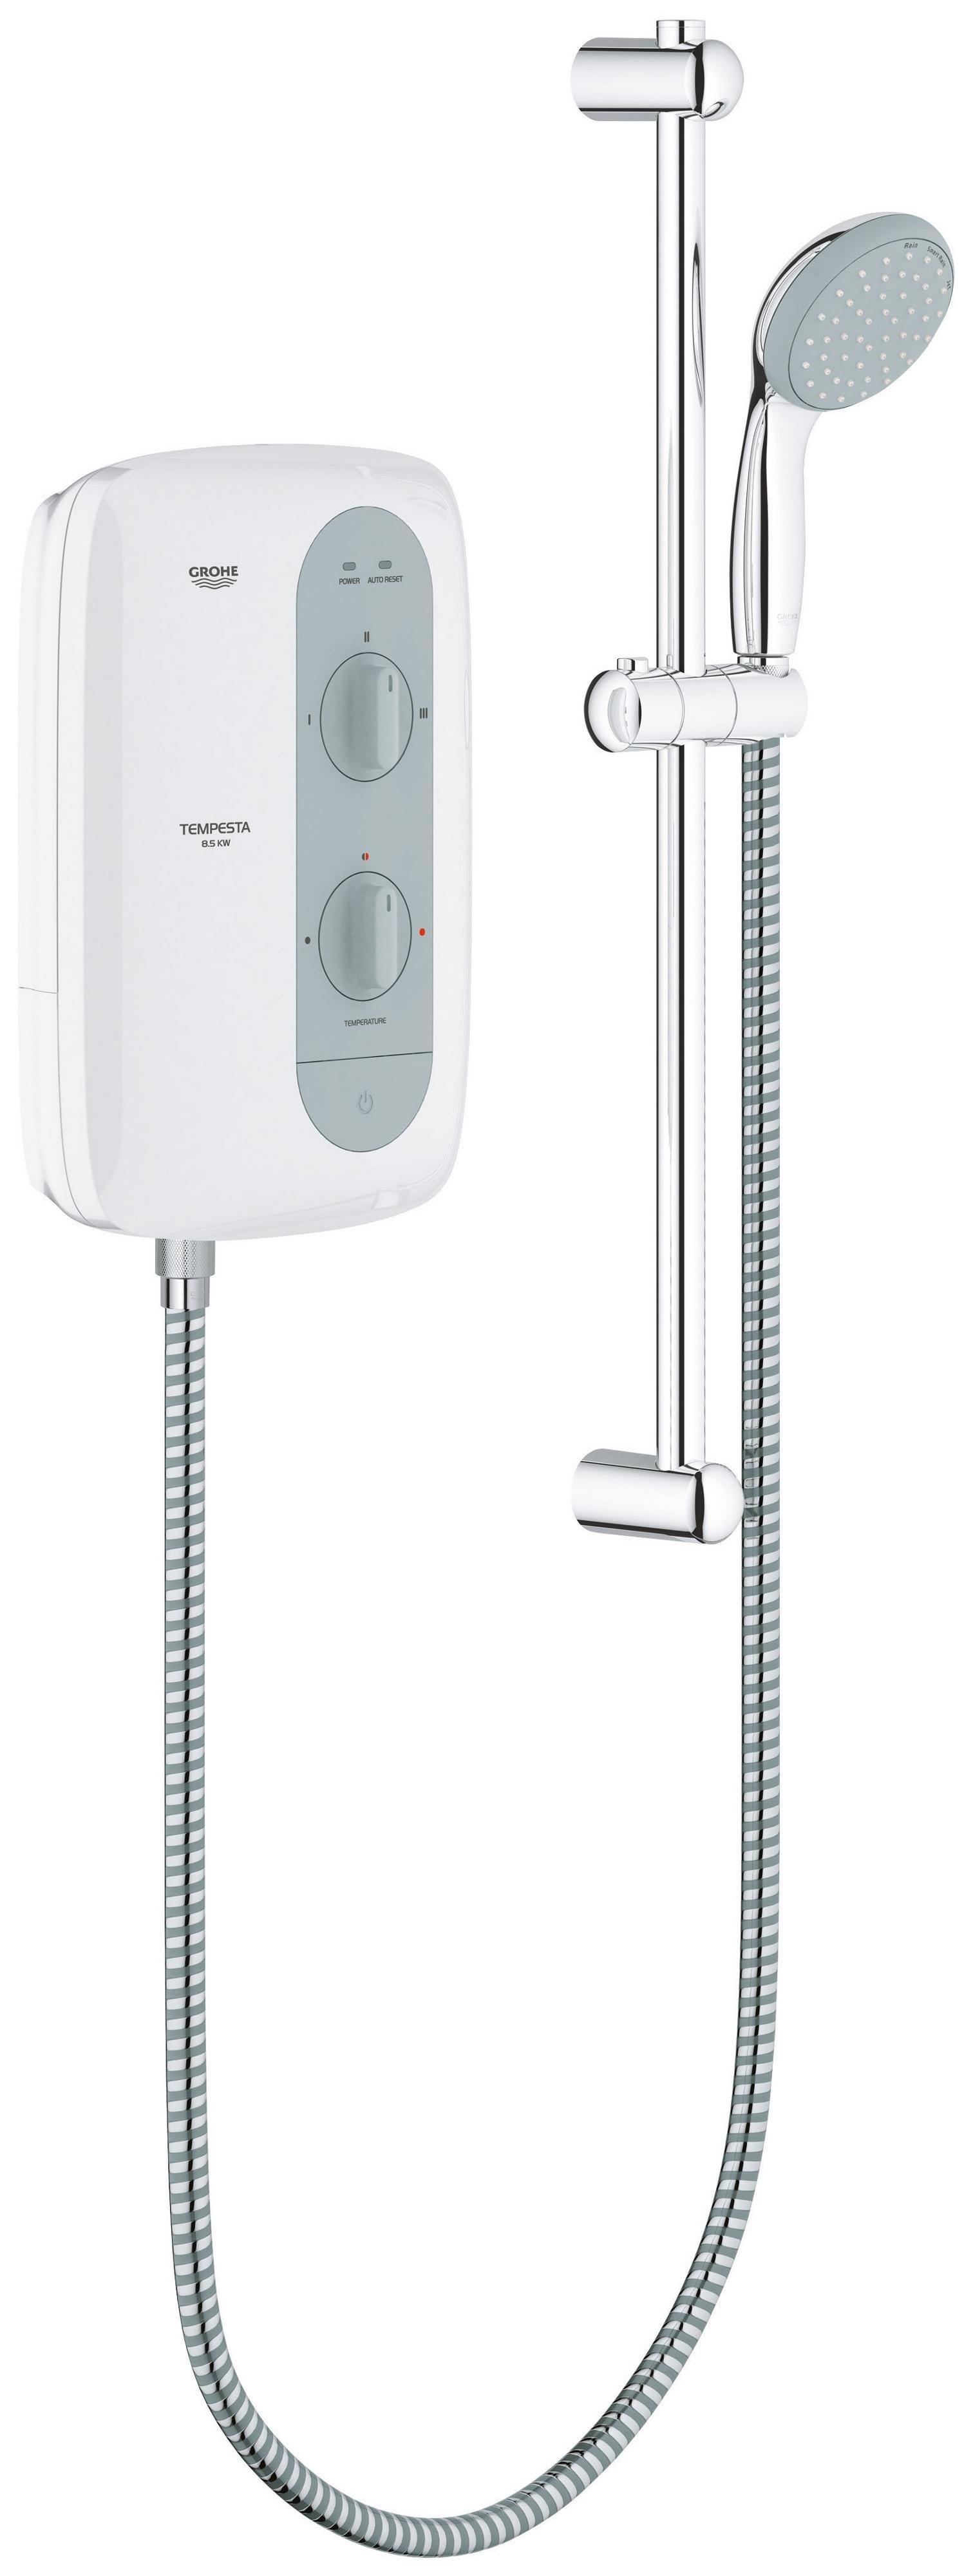 sale on grohe tempesta 100 8 5kw electric shower grey. Black Bedroom Furniture Sets. Home Design Ideas